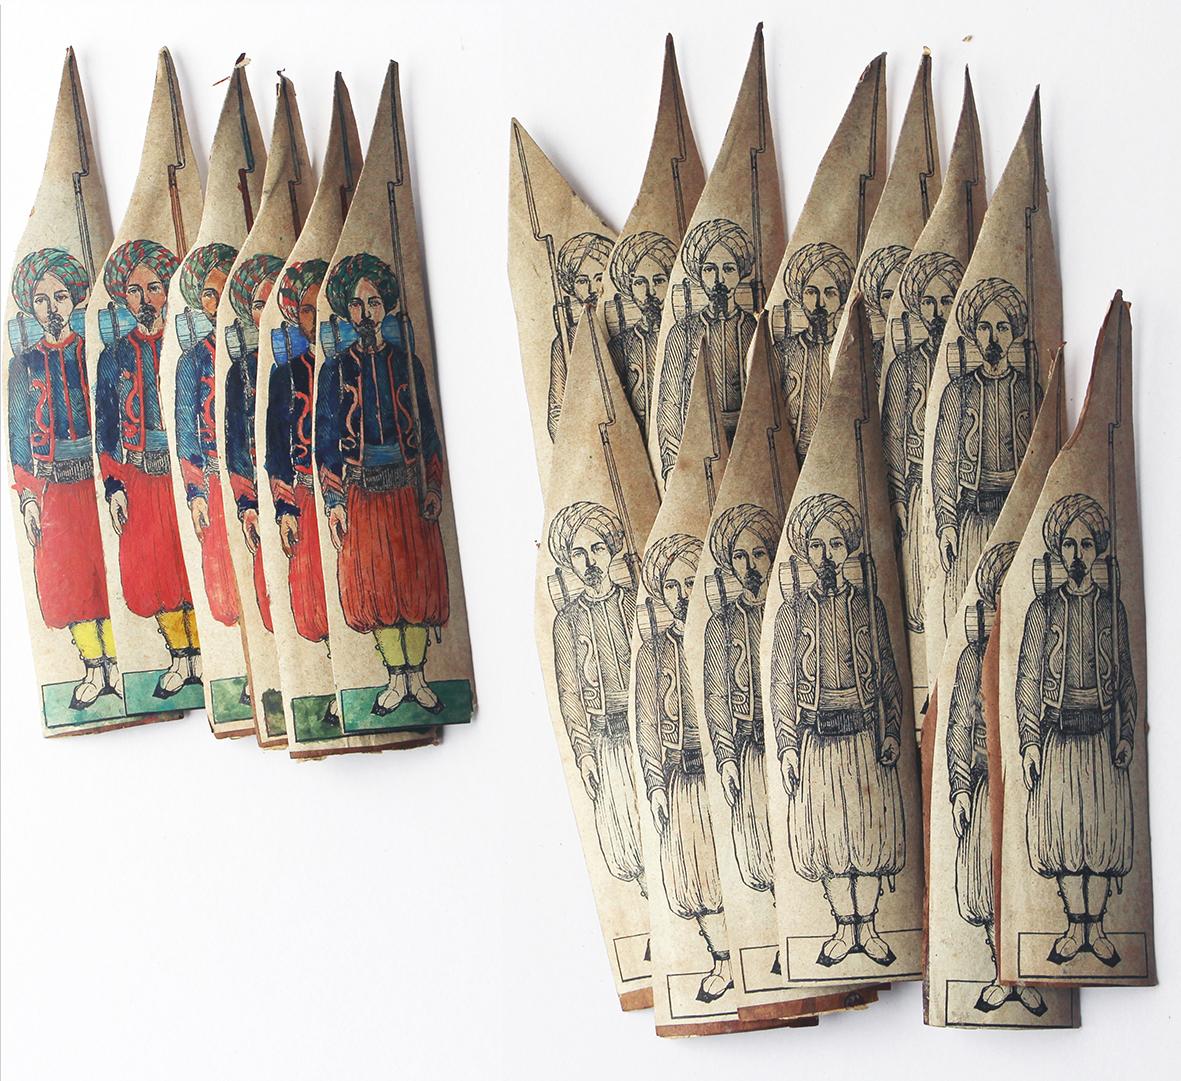 Lot Petits Soldats de Strasbourg - Silberman - Zouaves de la Garde Second Empire